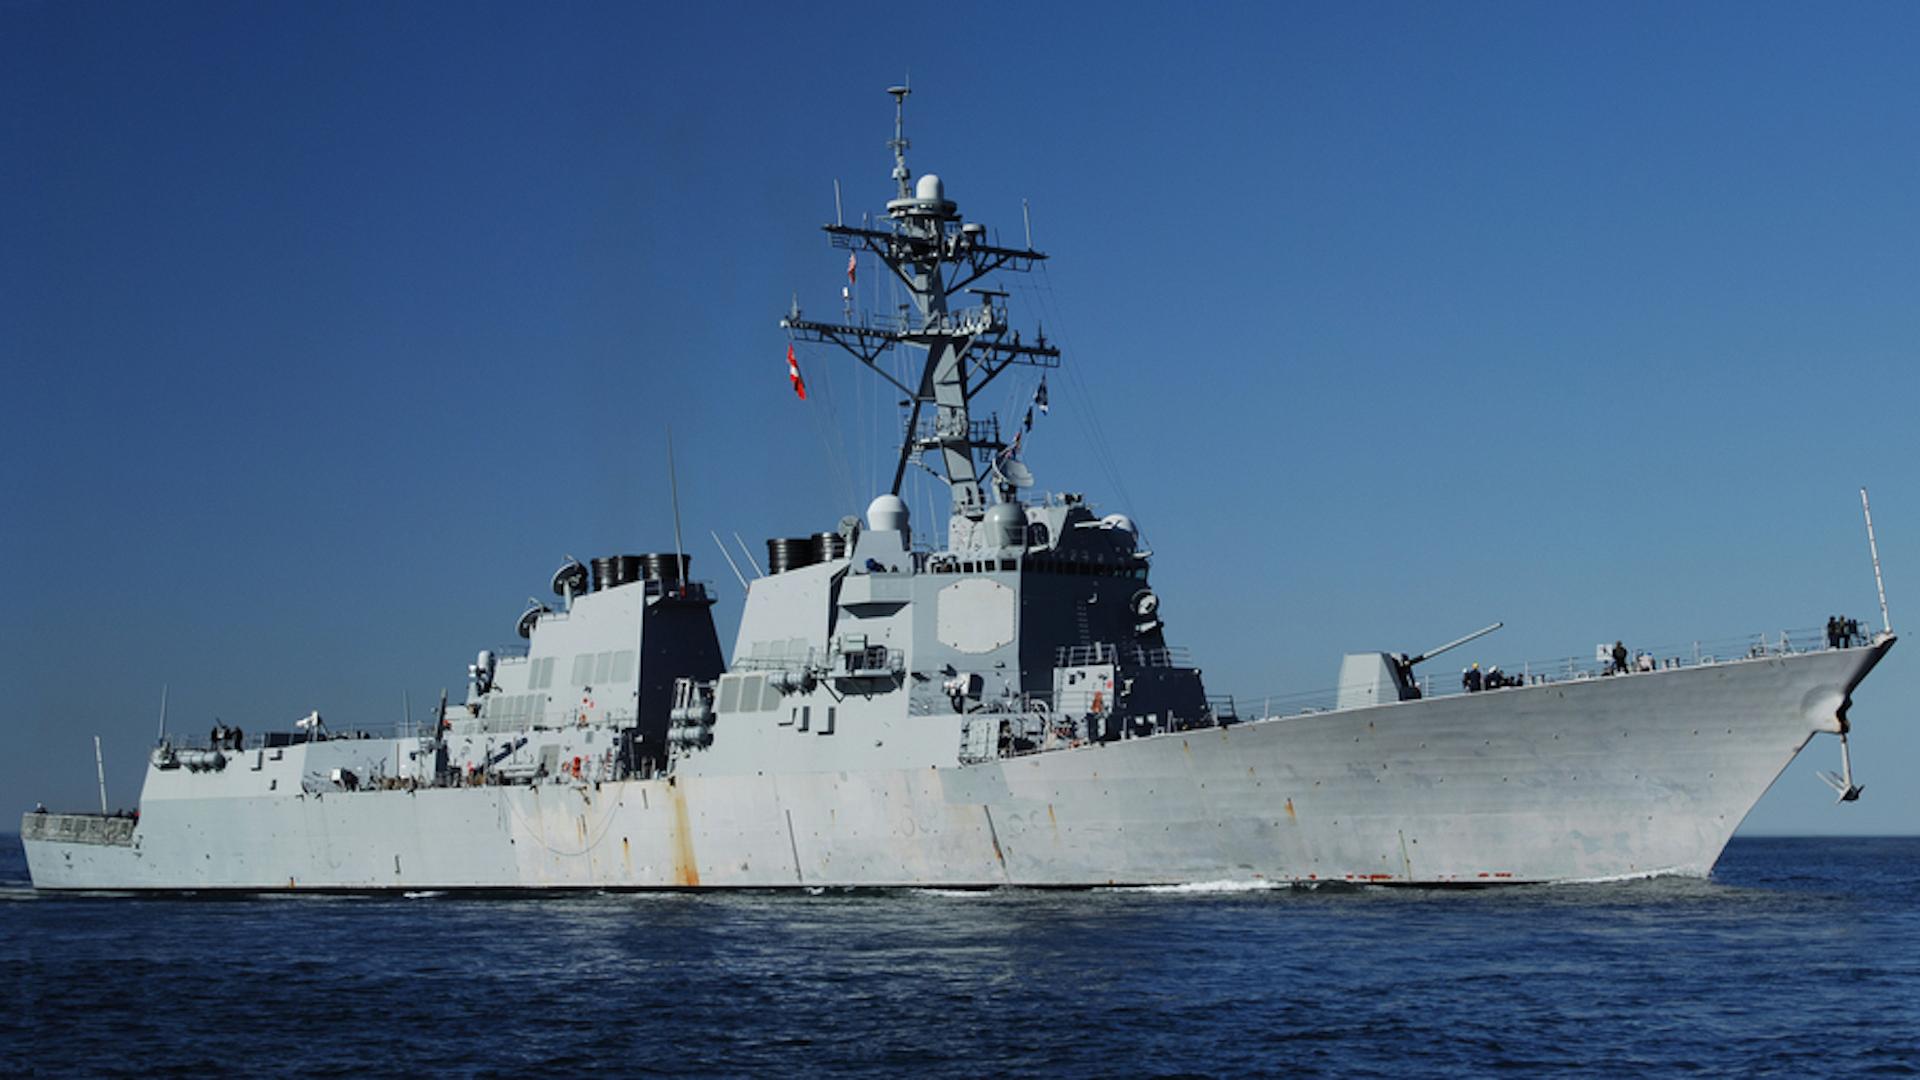 Naval destroyers